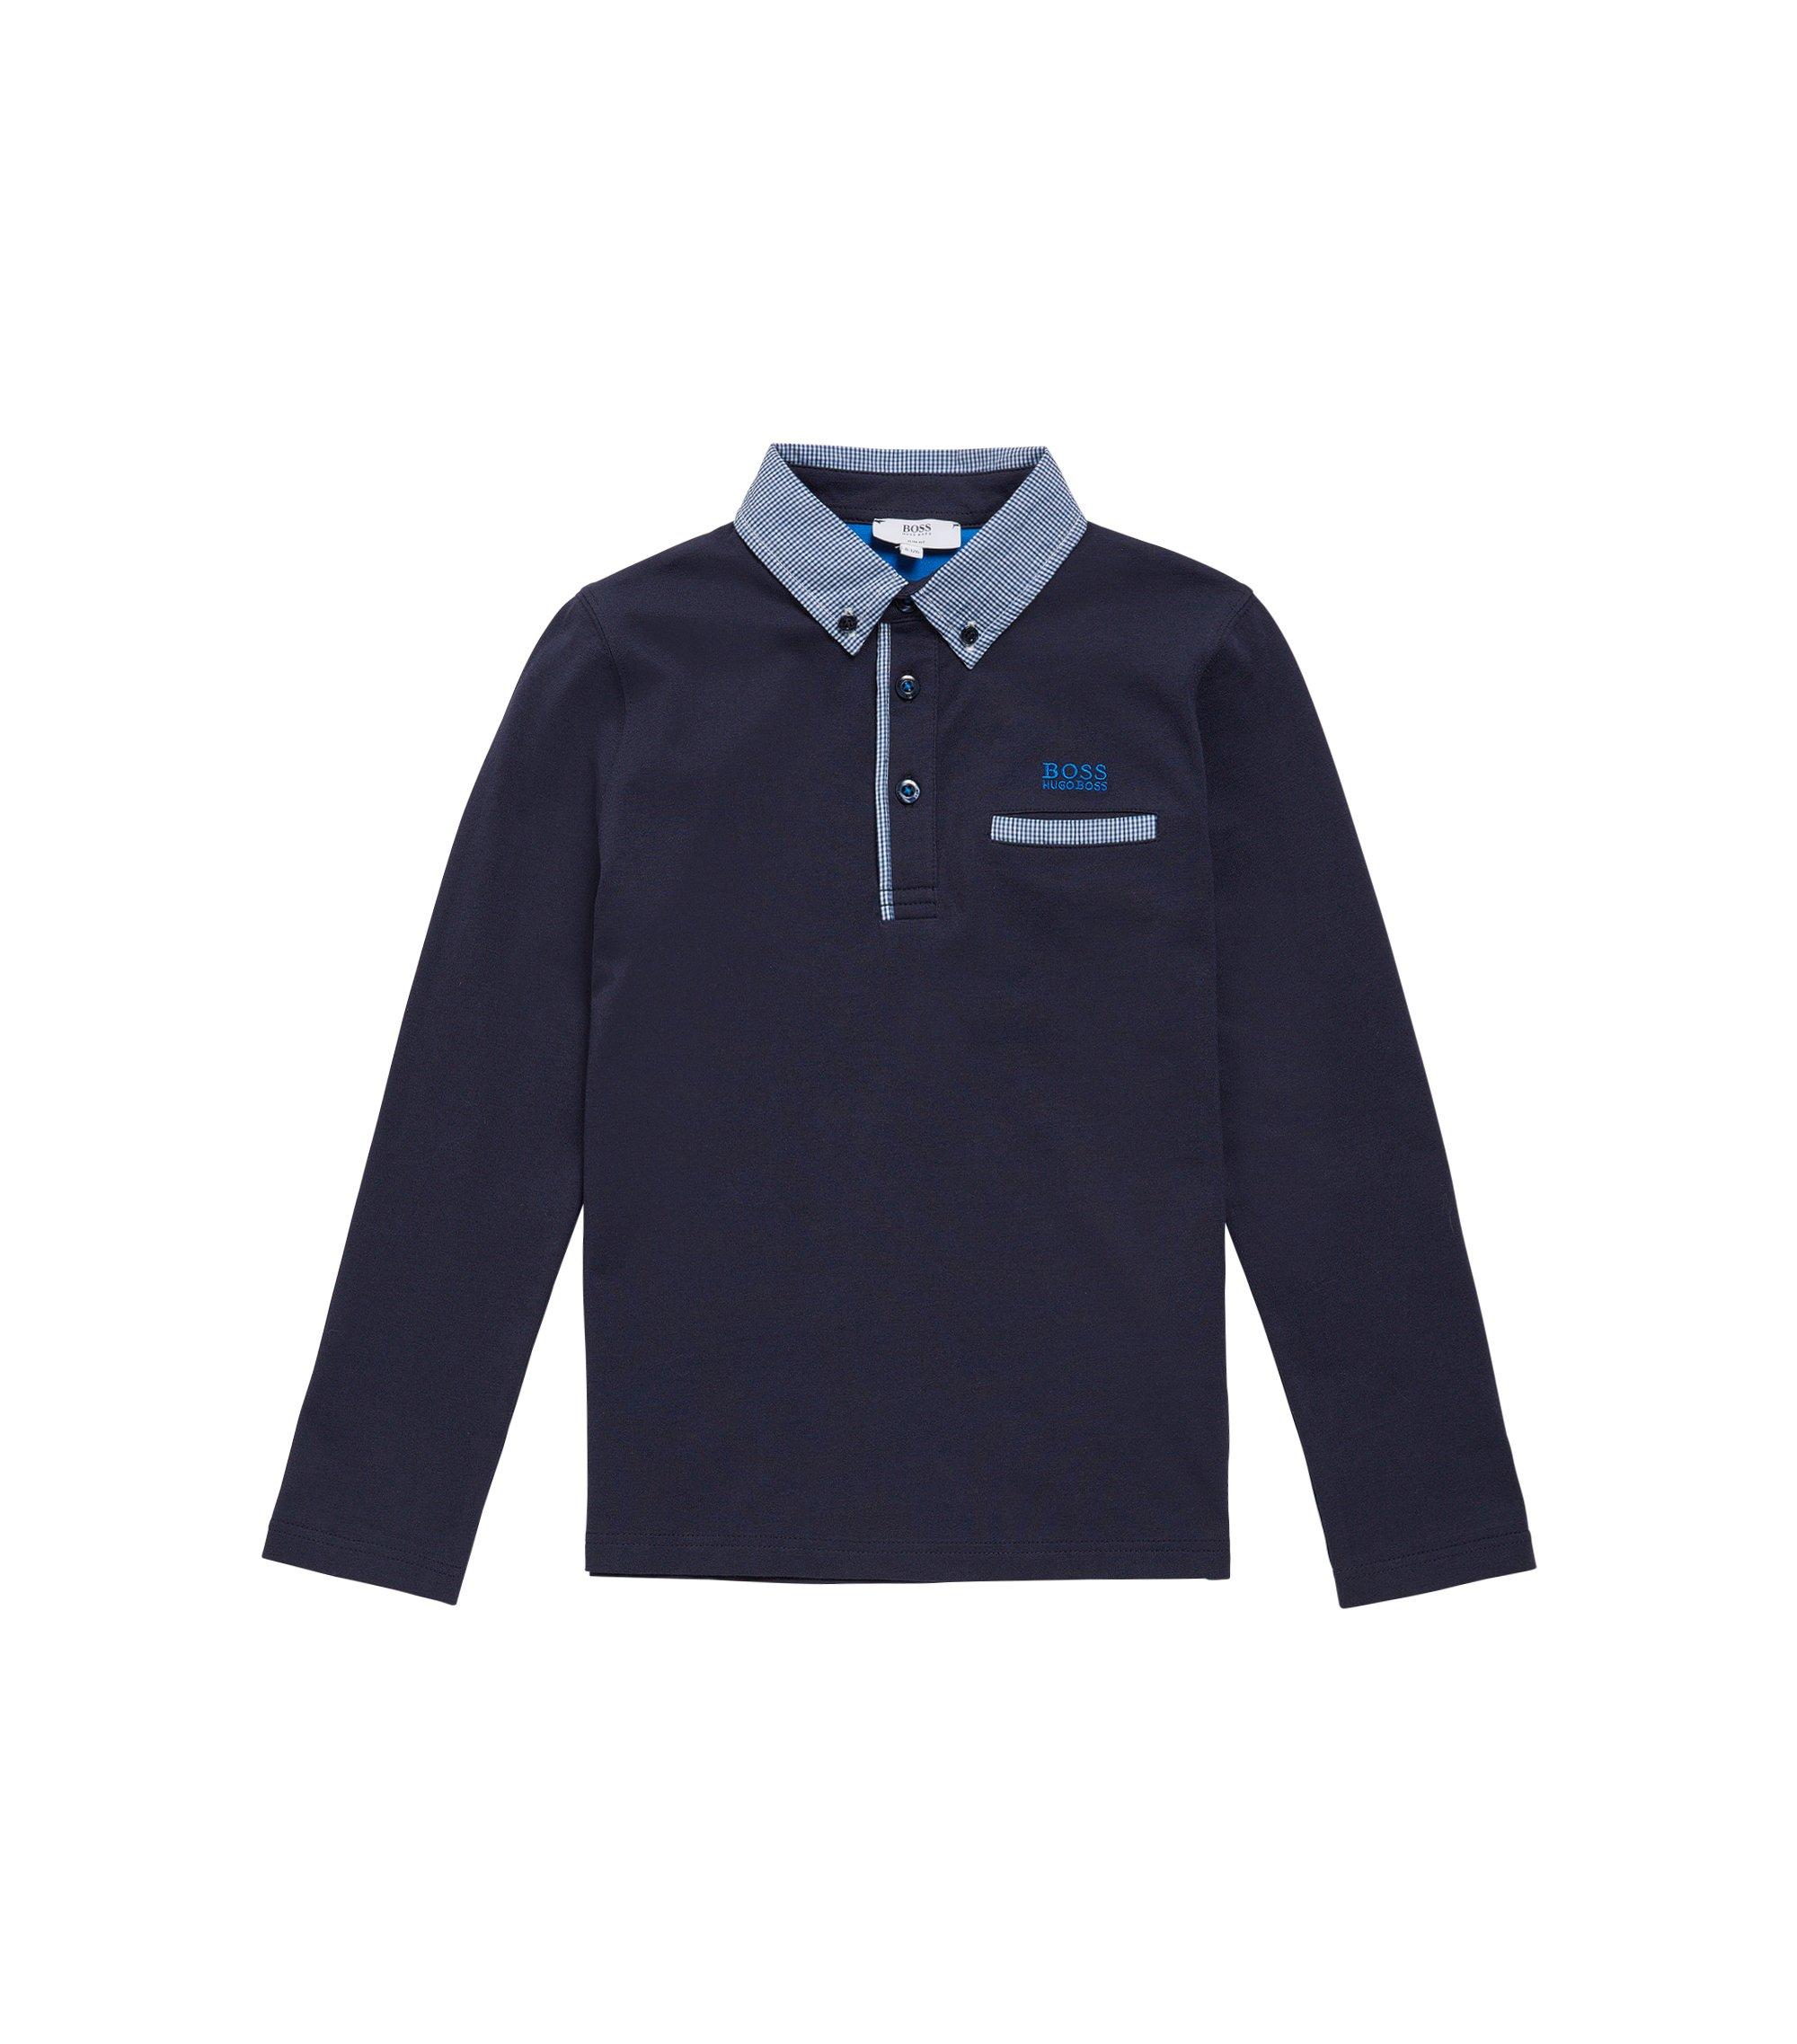 'J25993' | Boys Cotton Polo Shirt, Dark Blue